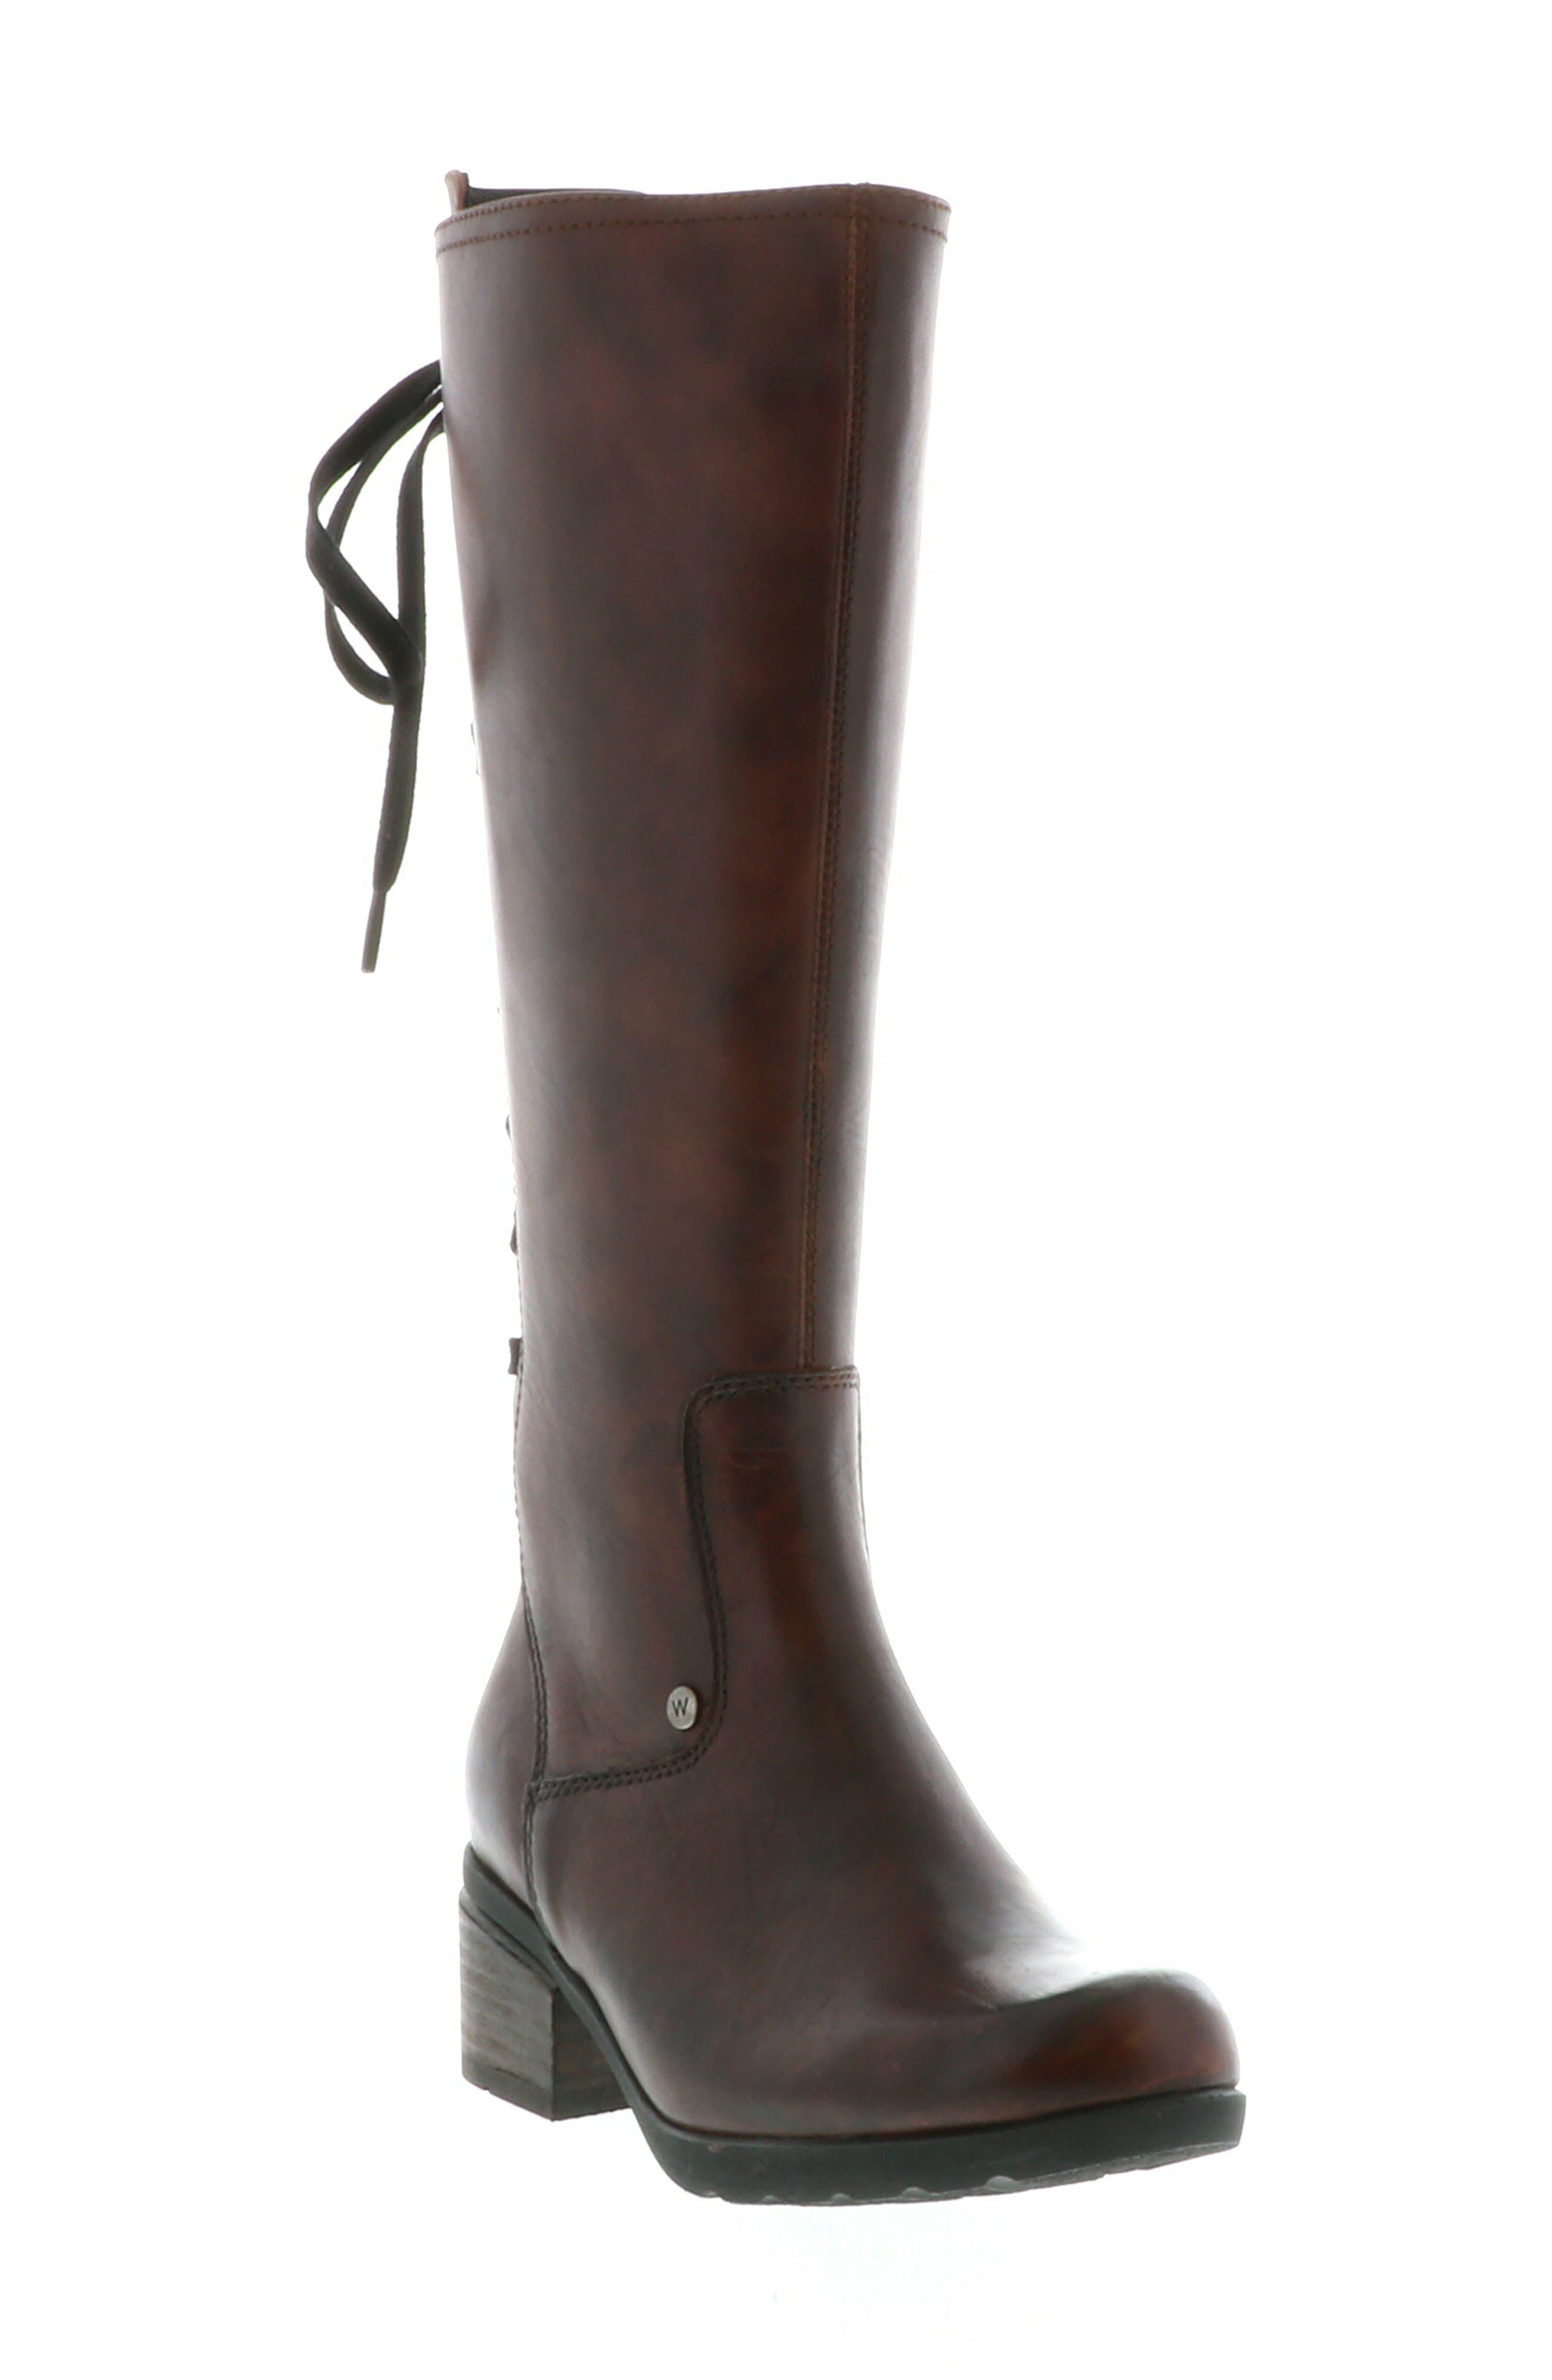 Wolky Hayen Knee High Boot - Brown